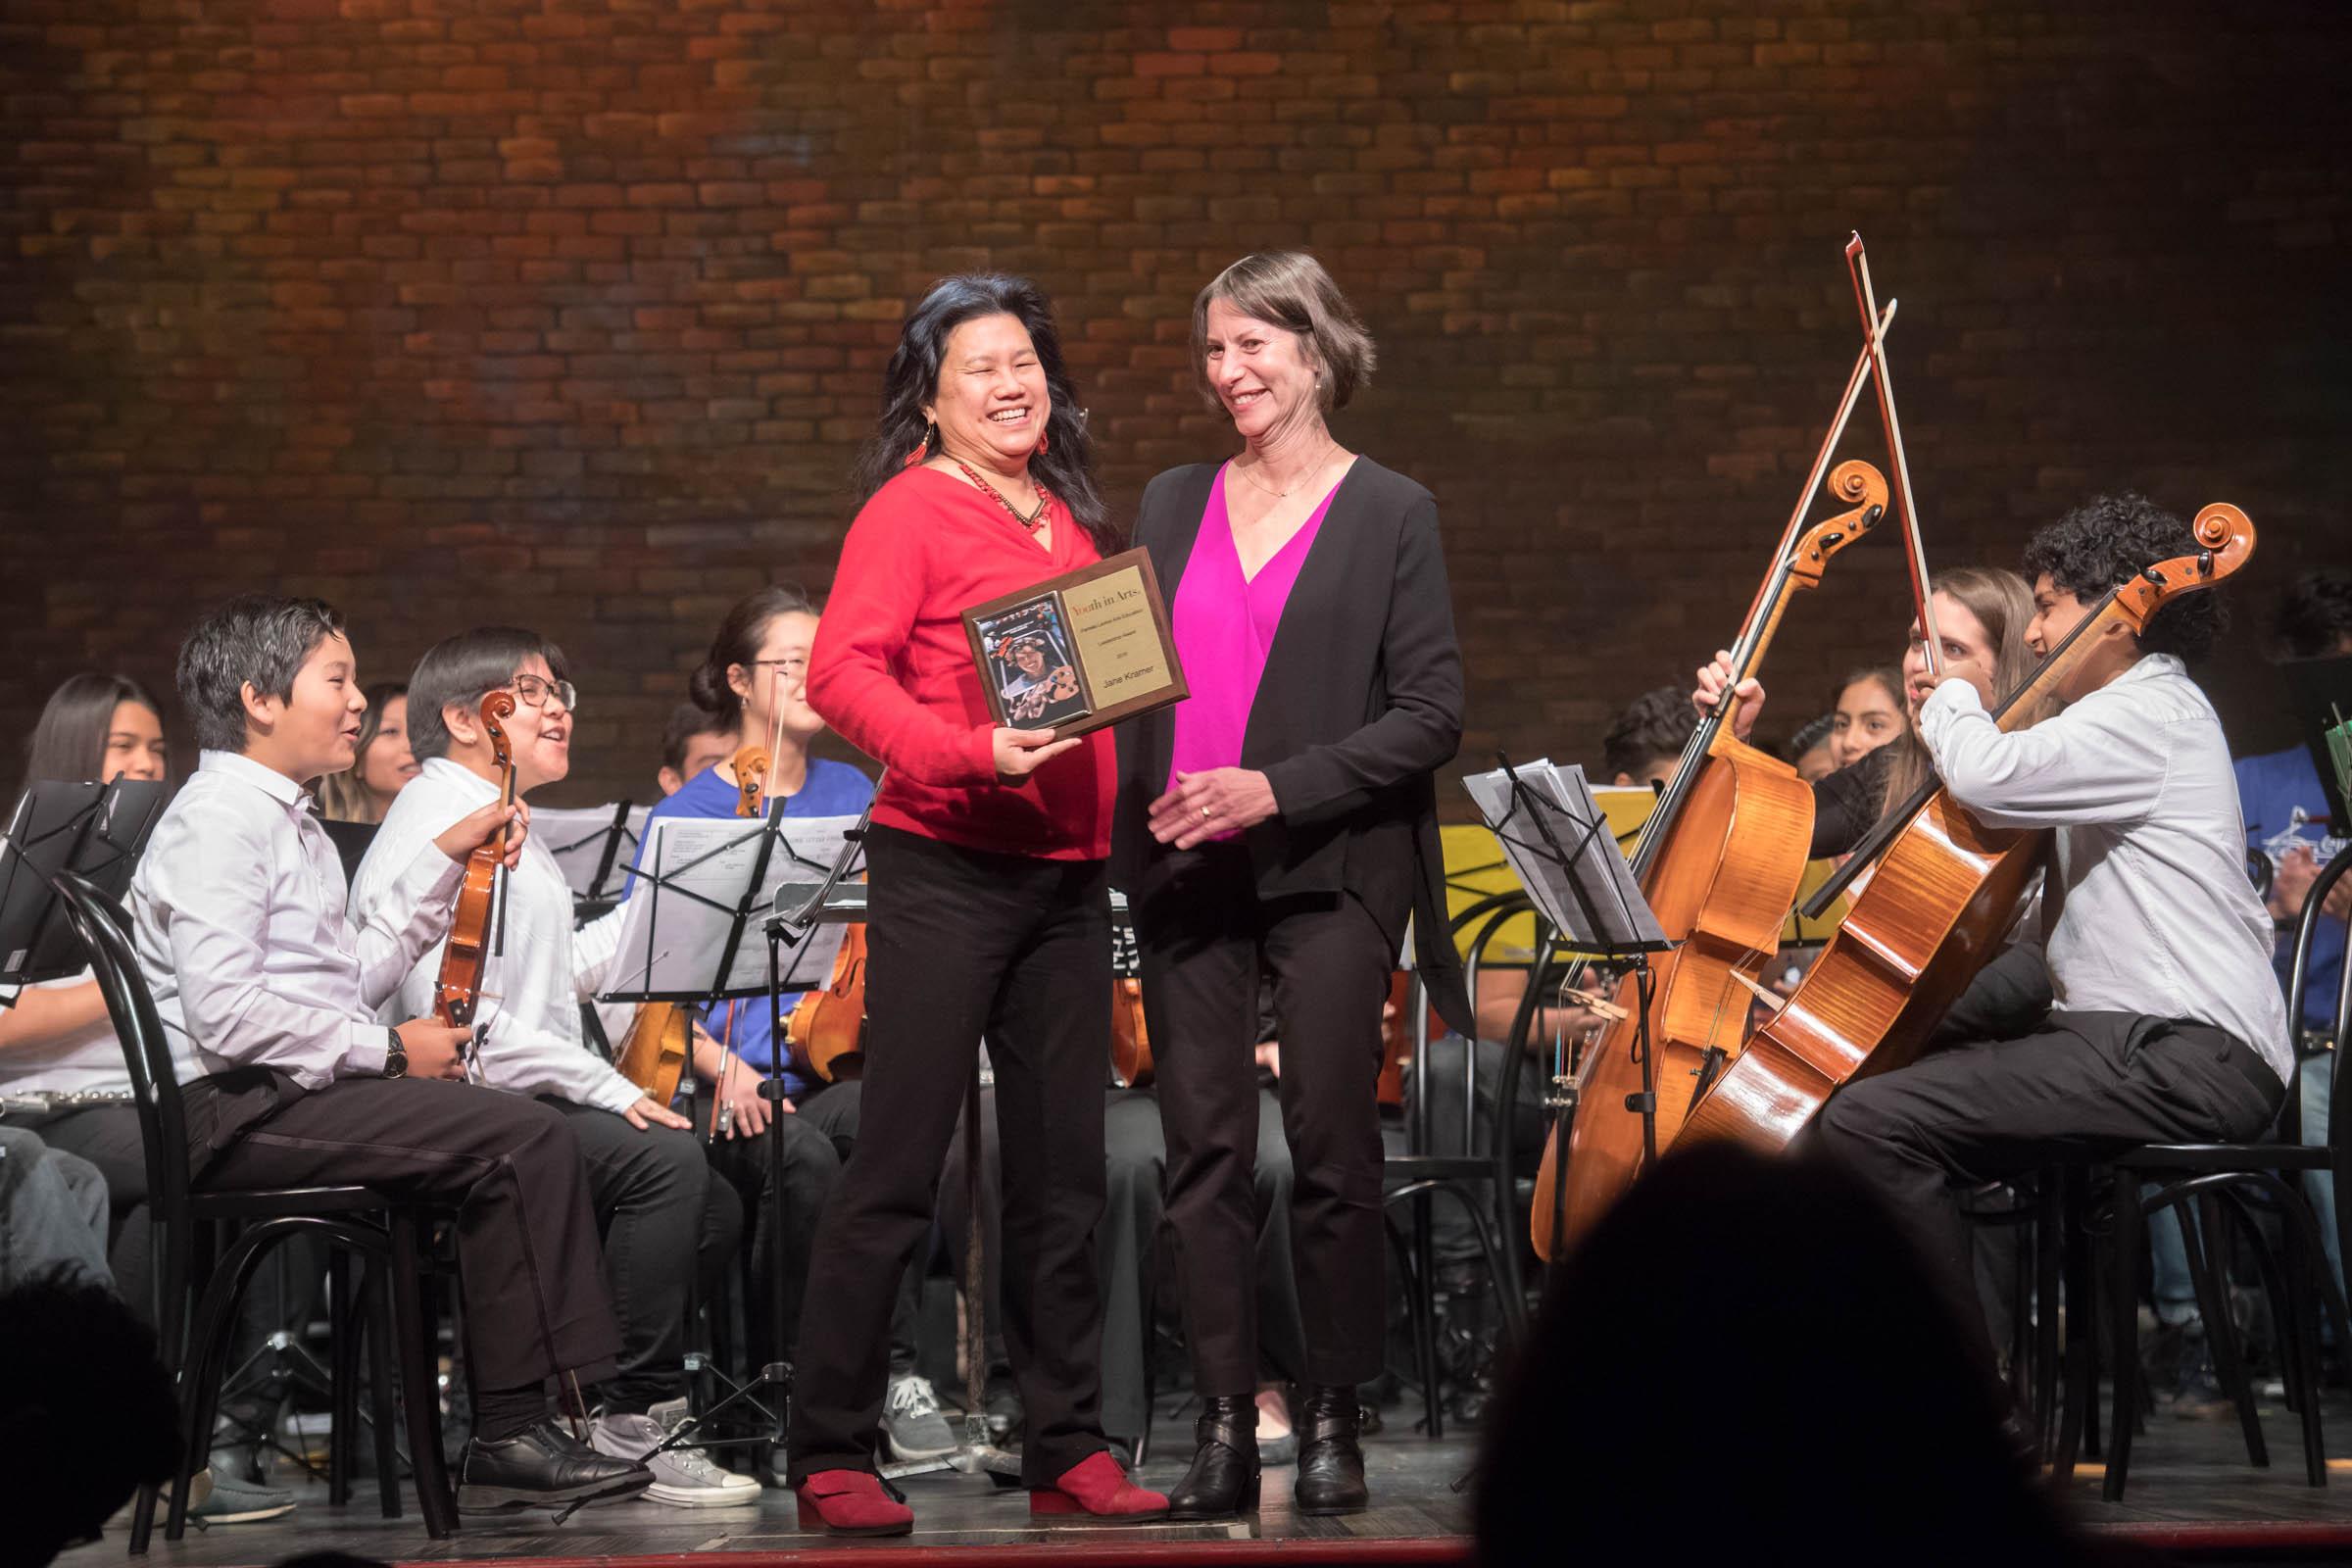 Miko gives award to Jane 2016.jpg